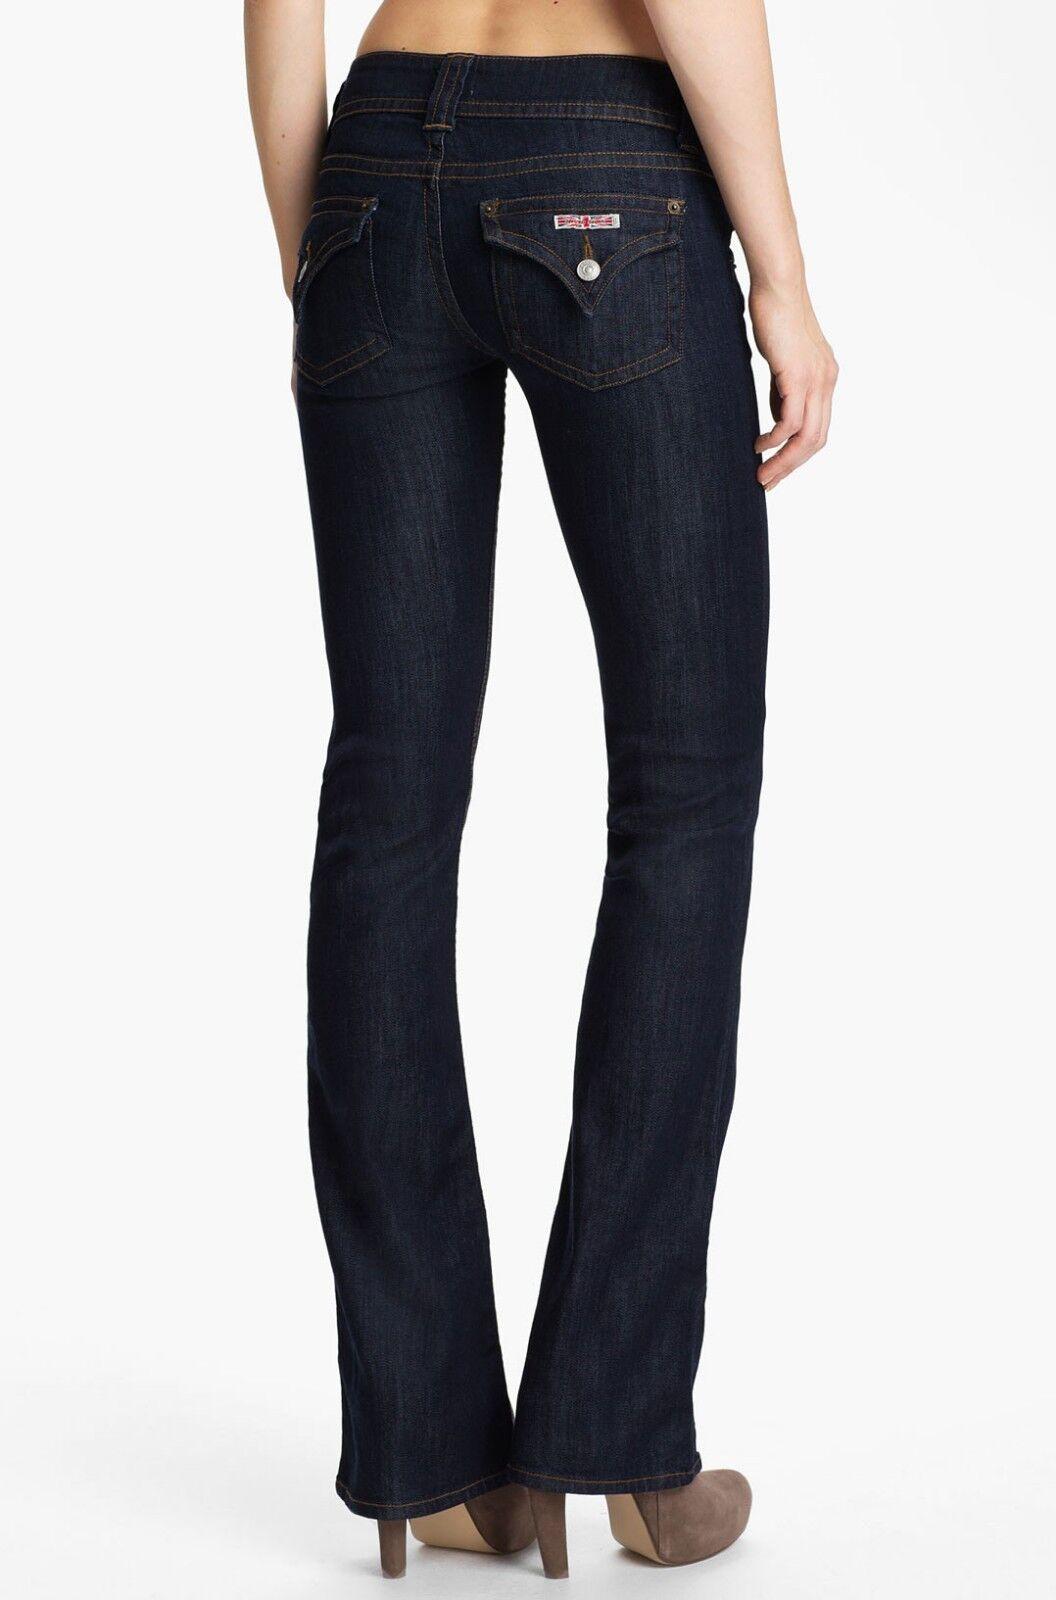 NWT HUDSON FINCH Signature Boot Cut Jeans 29 BRAND NEW DARK blueE DENIM  W170DGC